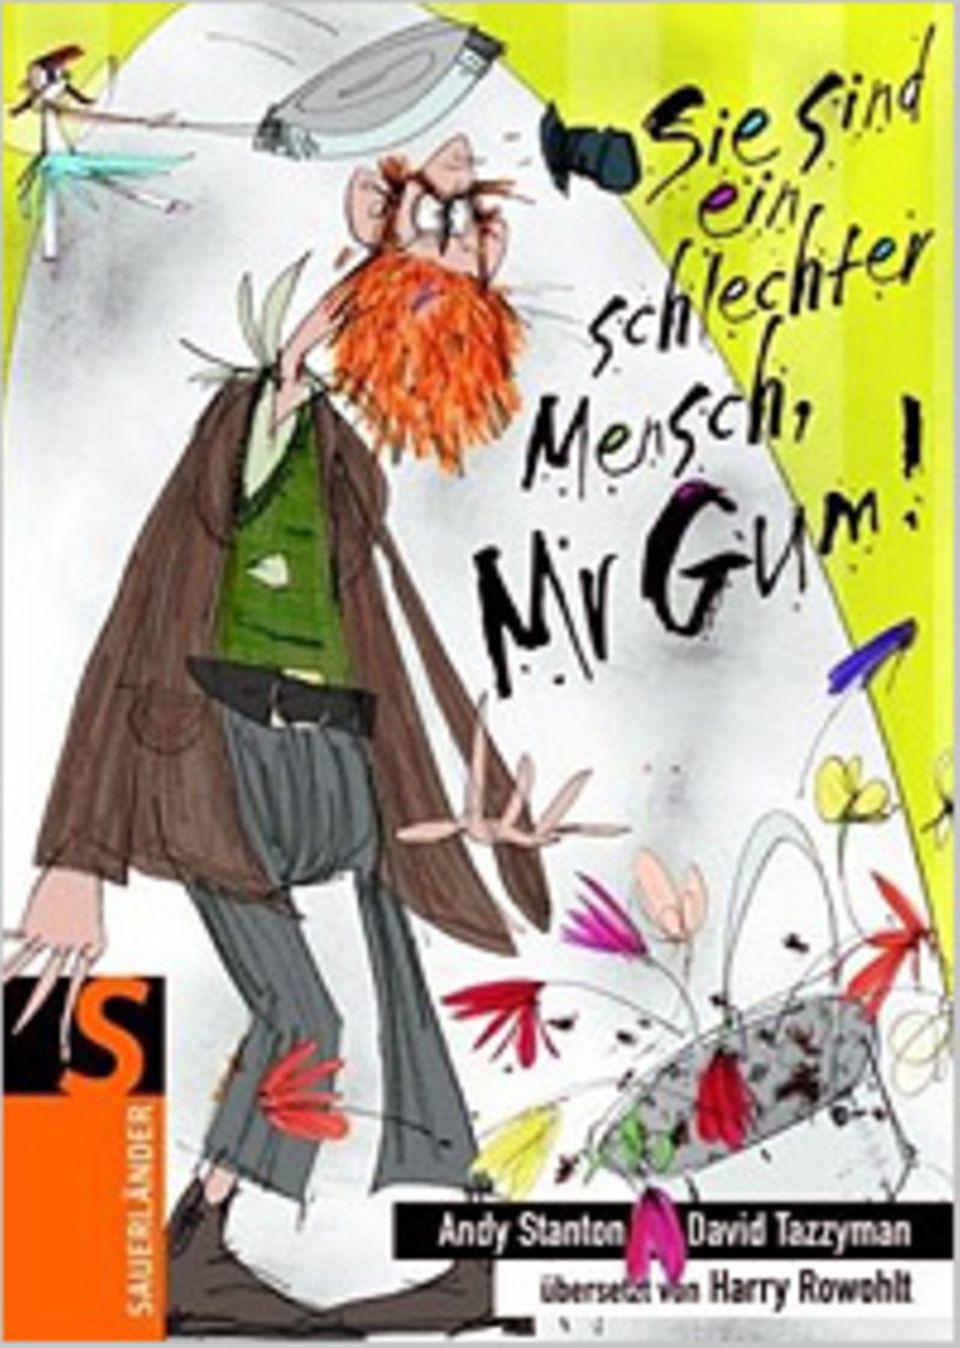 Buchtipp: Mies, mieser, Mister Gum!